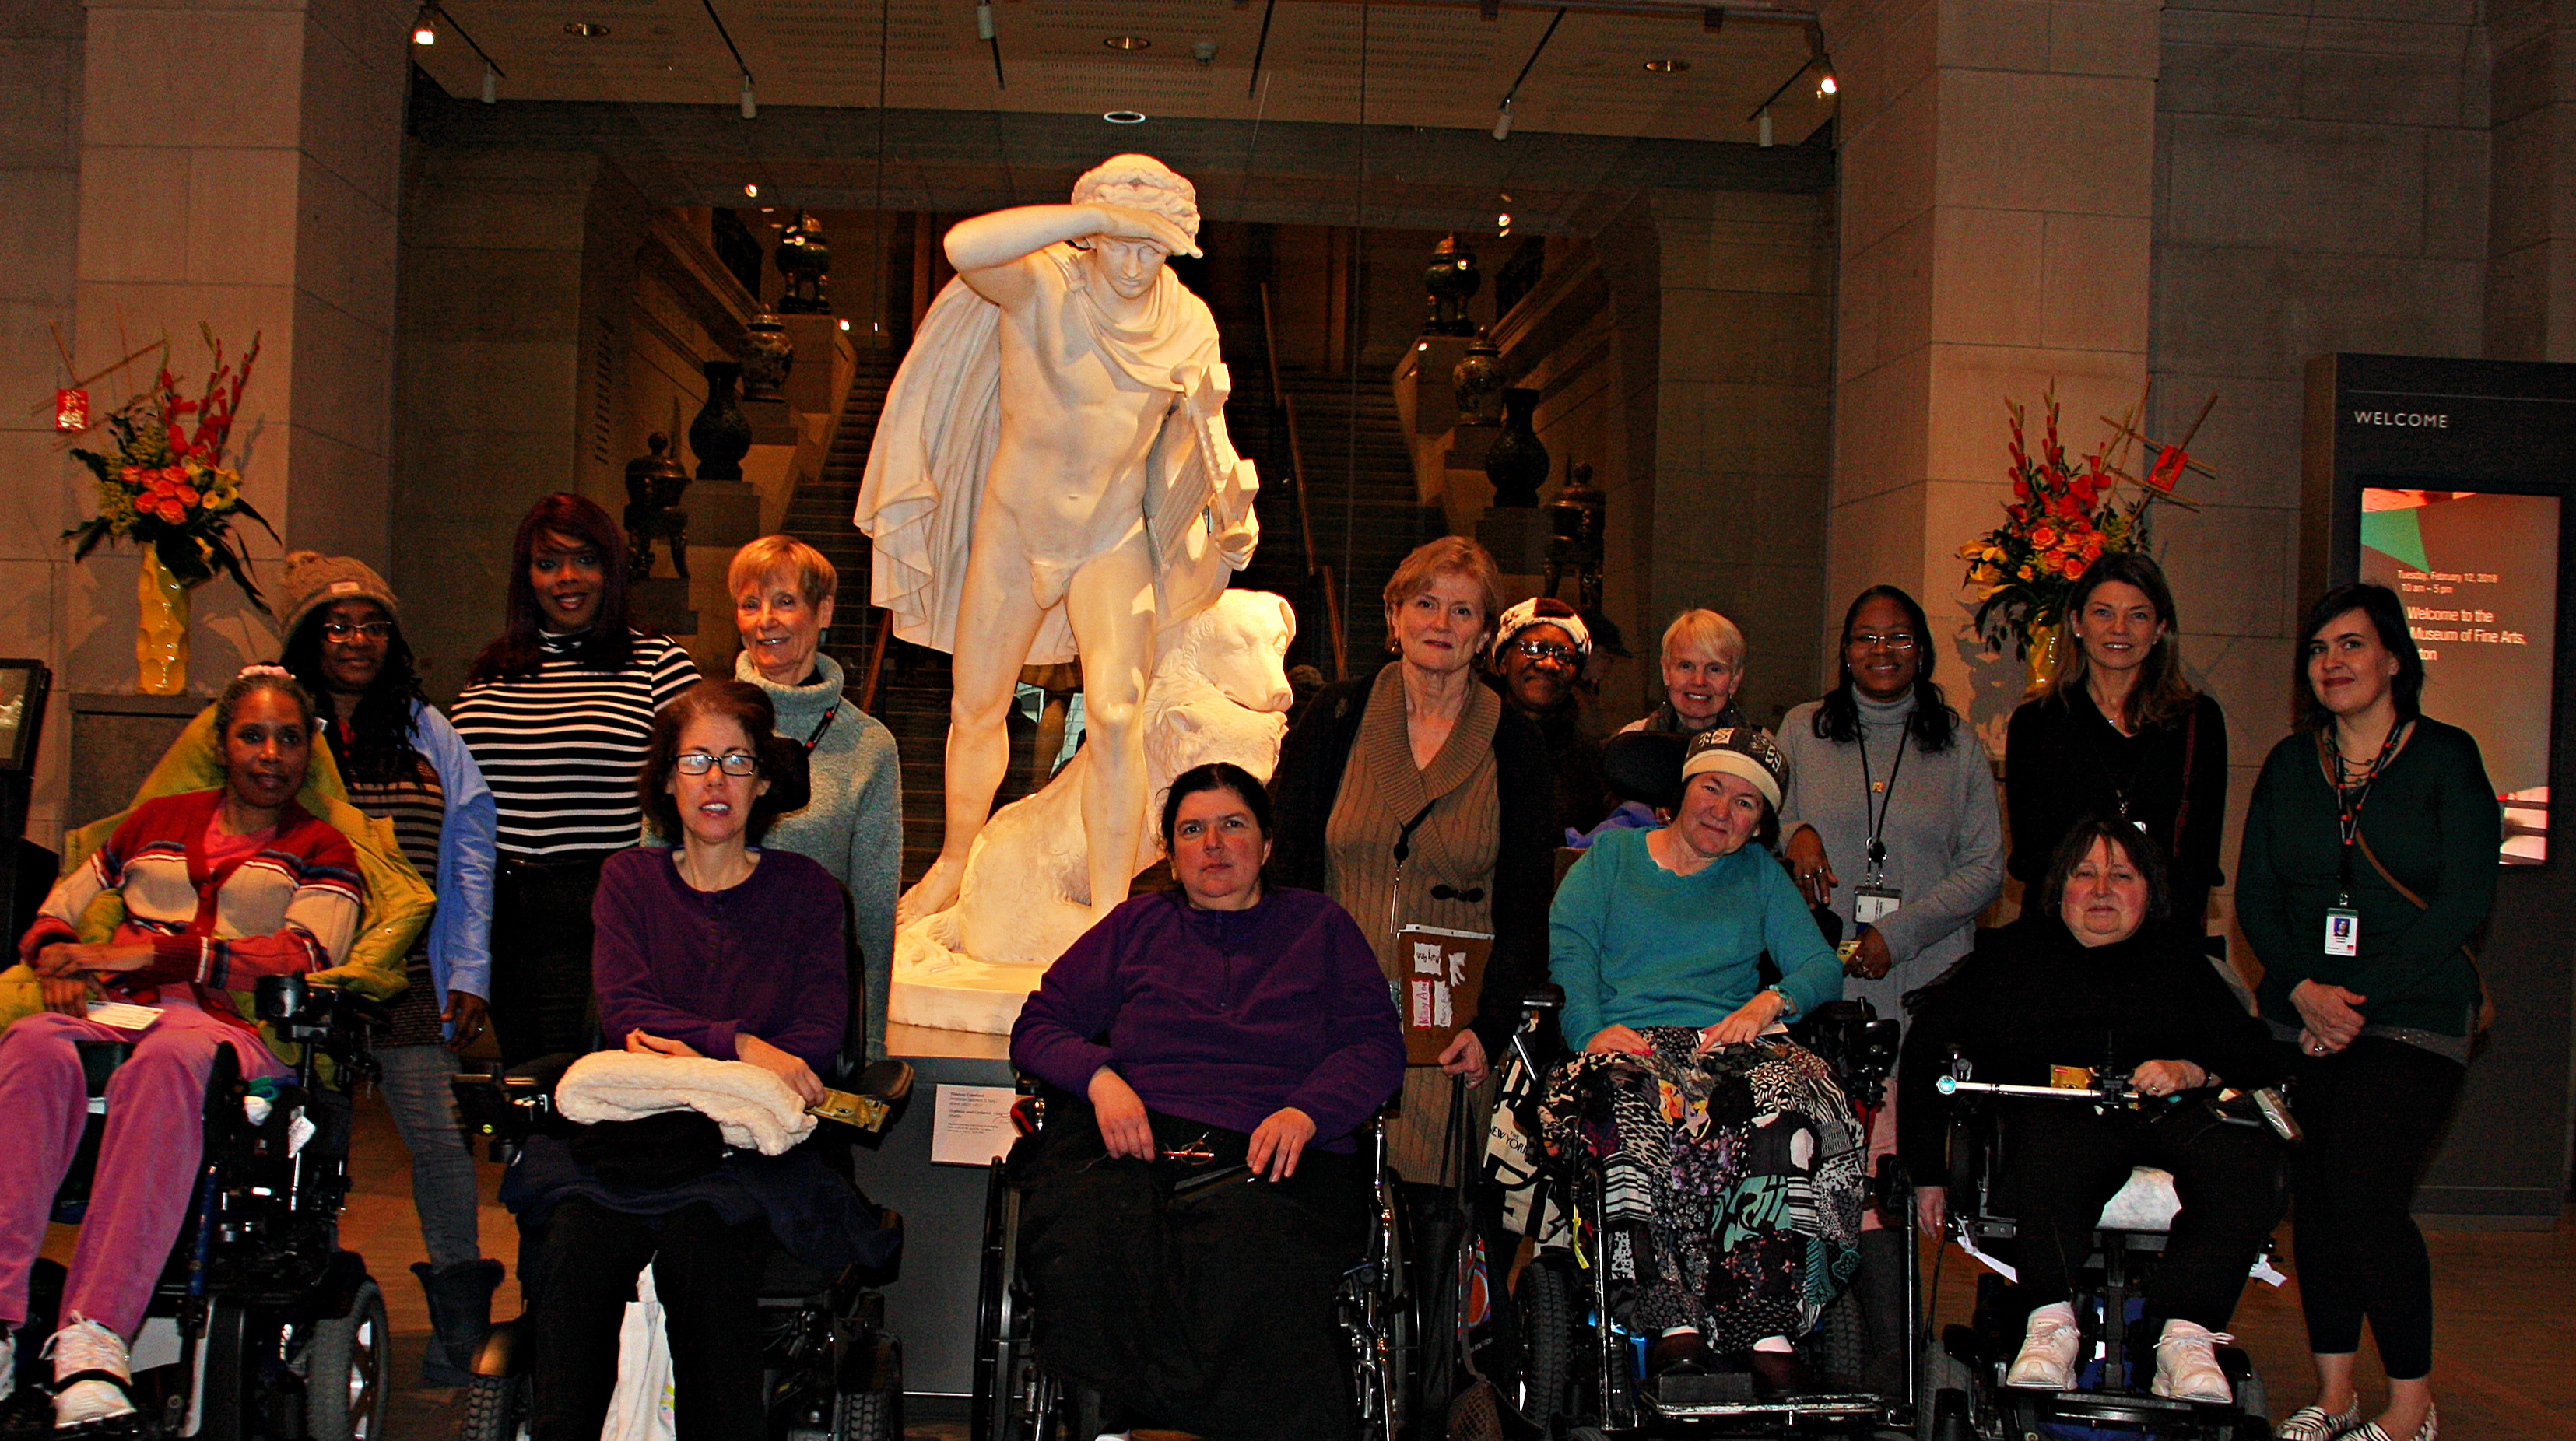 B'Fit Members Visited Museum of Fine Arts - Ansel Adams Exhibit